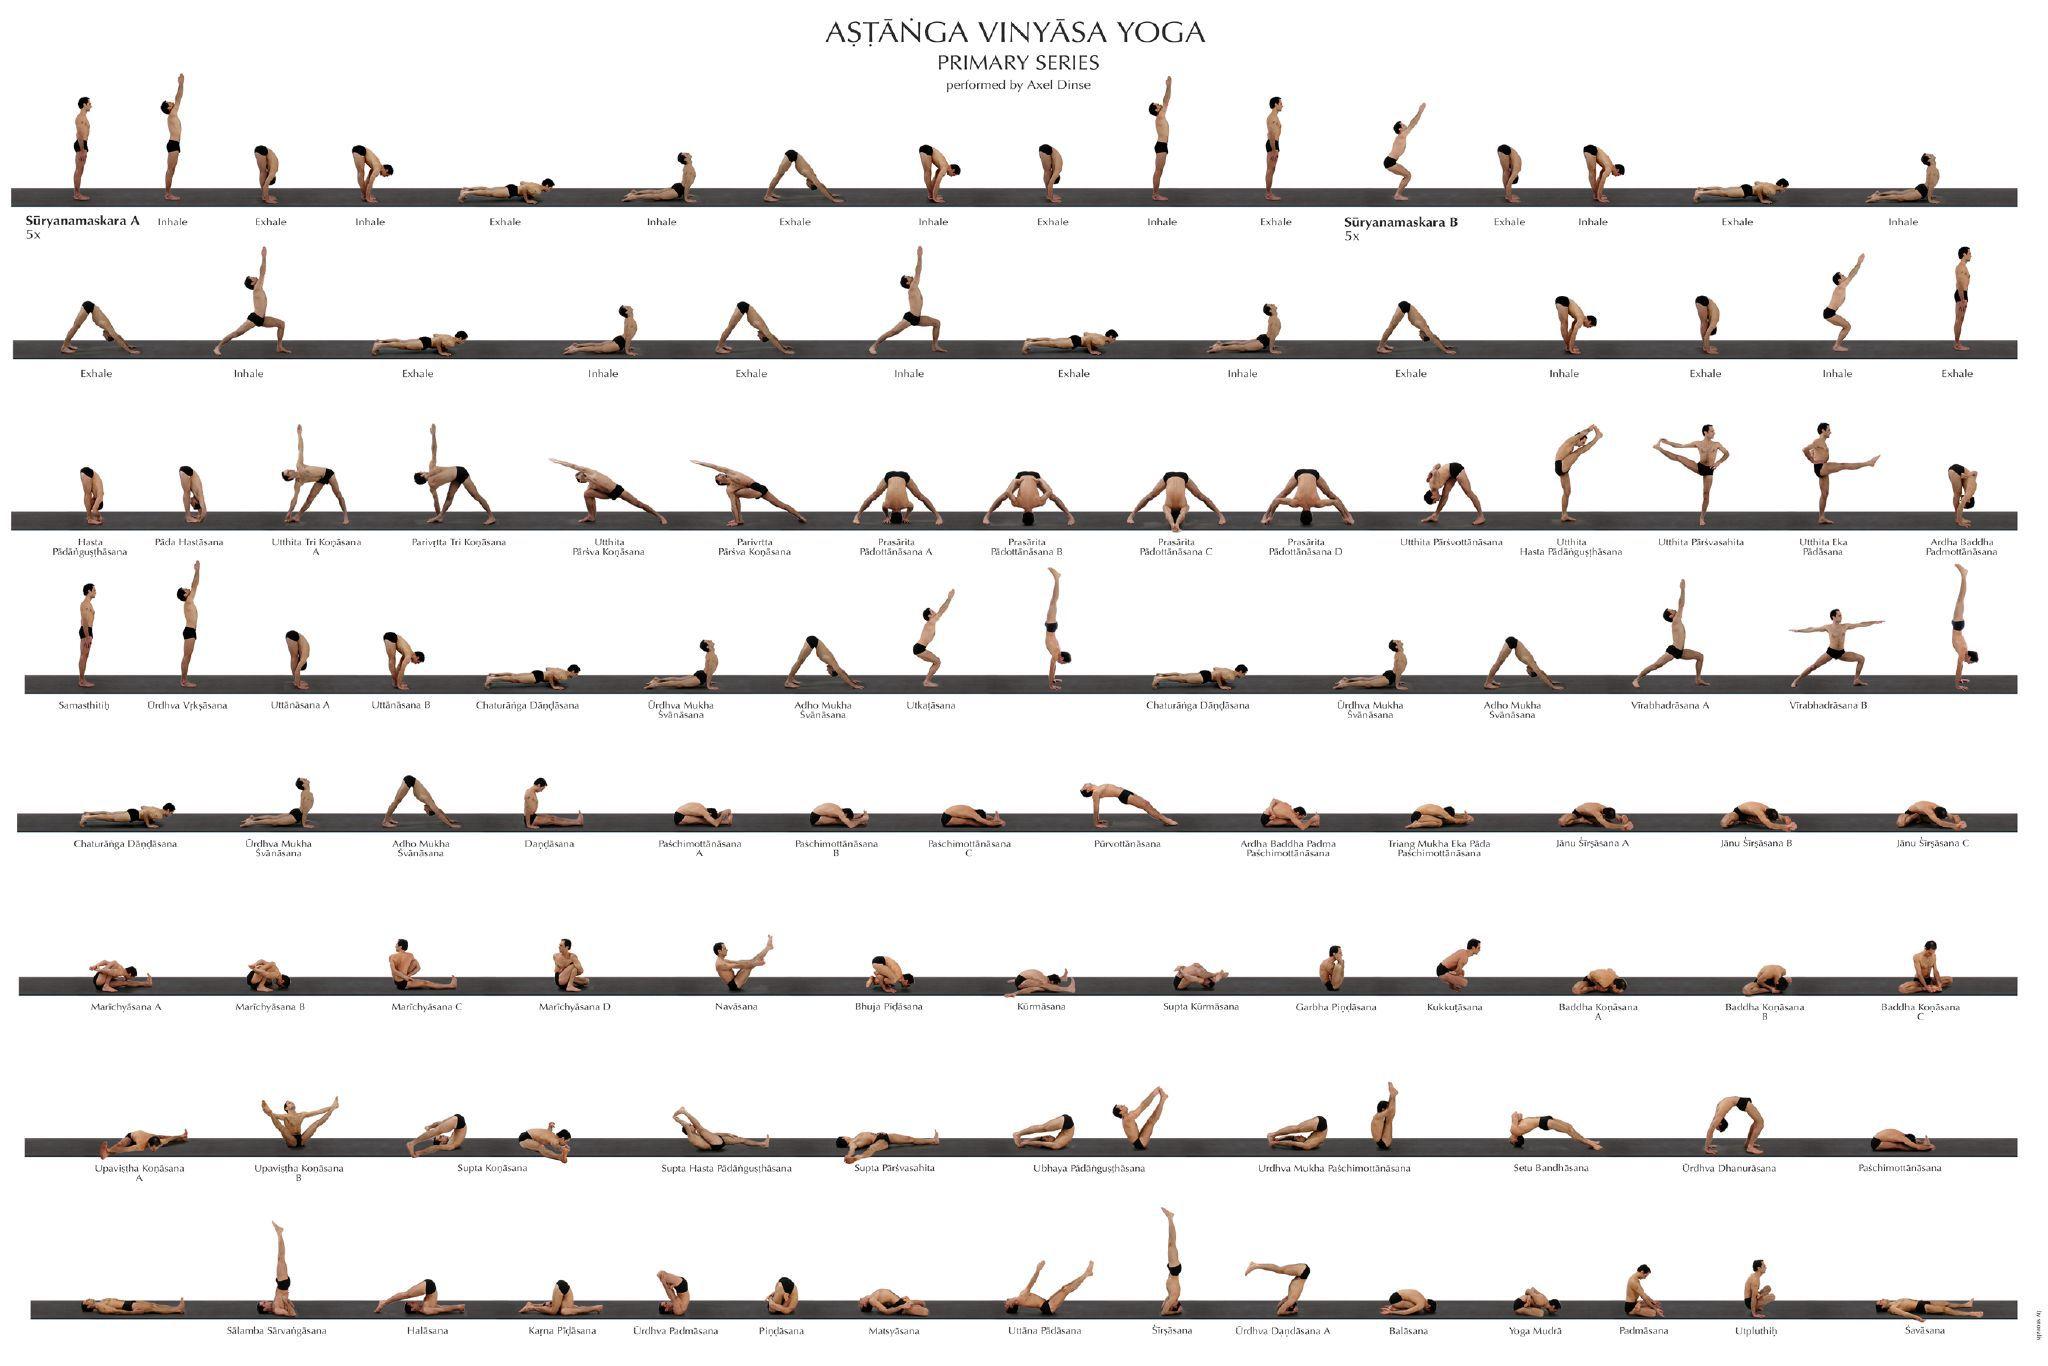 Ashtanga Yoga of Patanjali - Postures or Asanas in Ashtanga Yoga